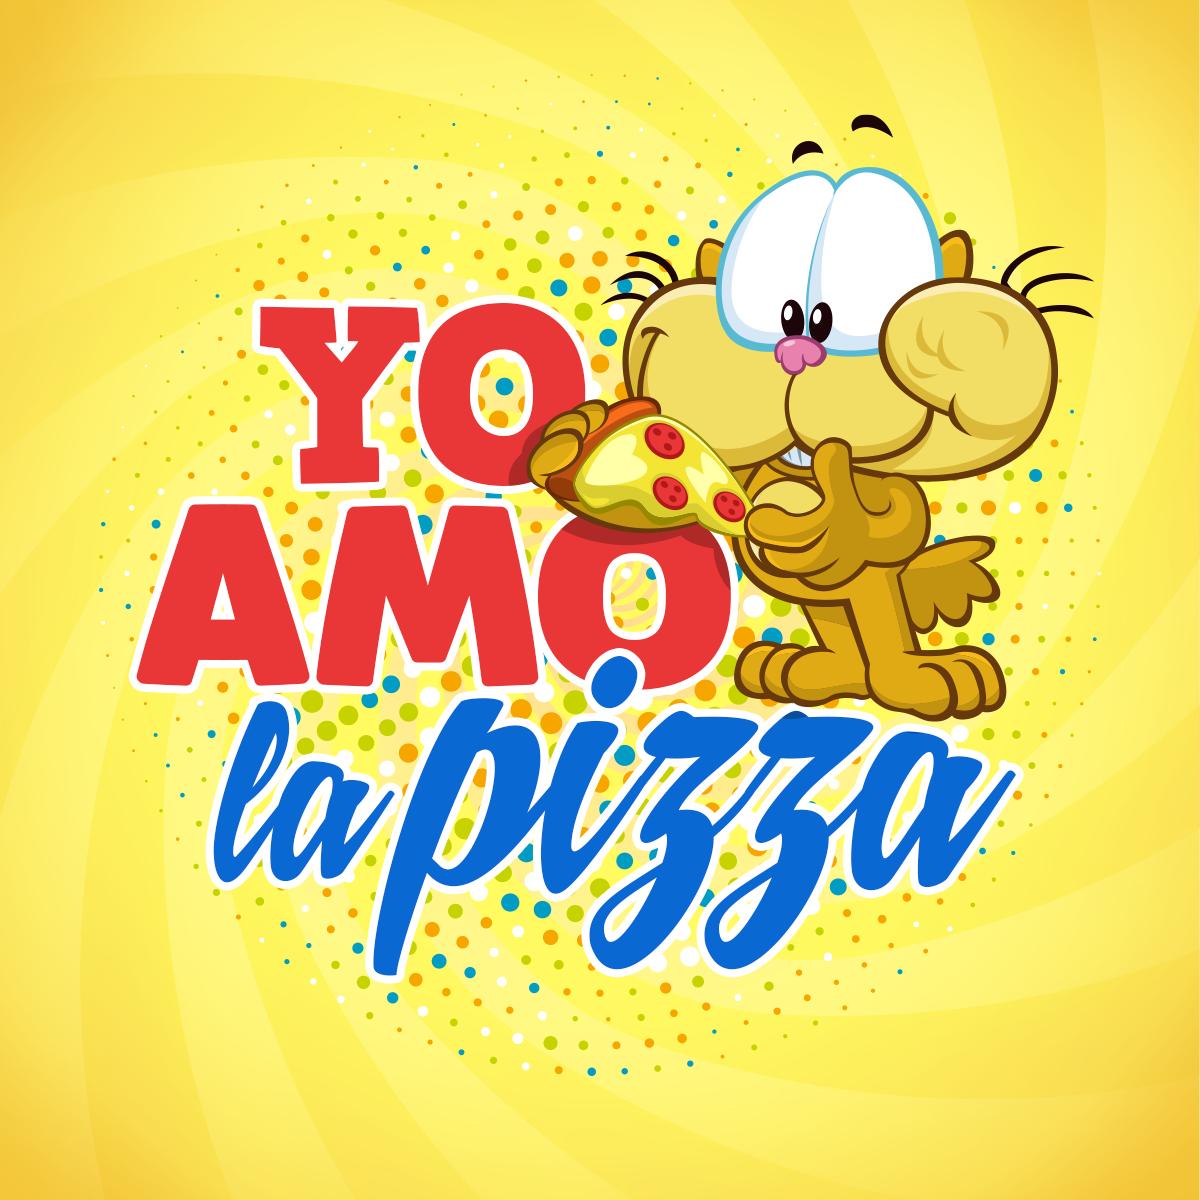 Yo Amo La Pizza Gaturro Amor Gracioso Y Frases Cortas